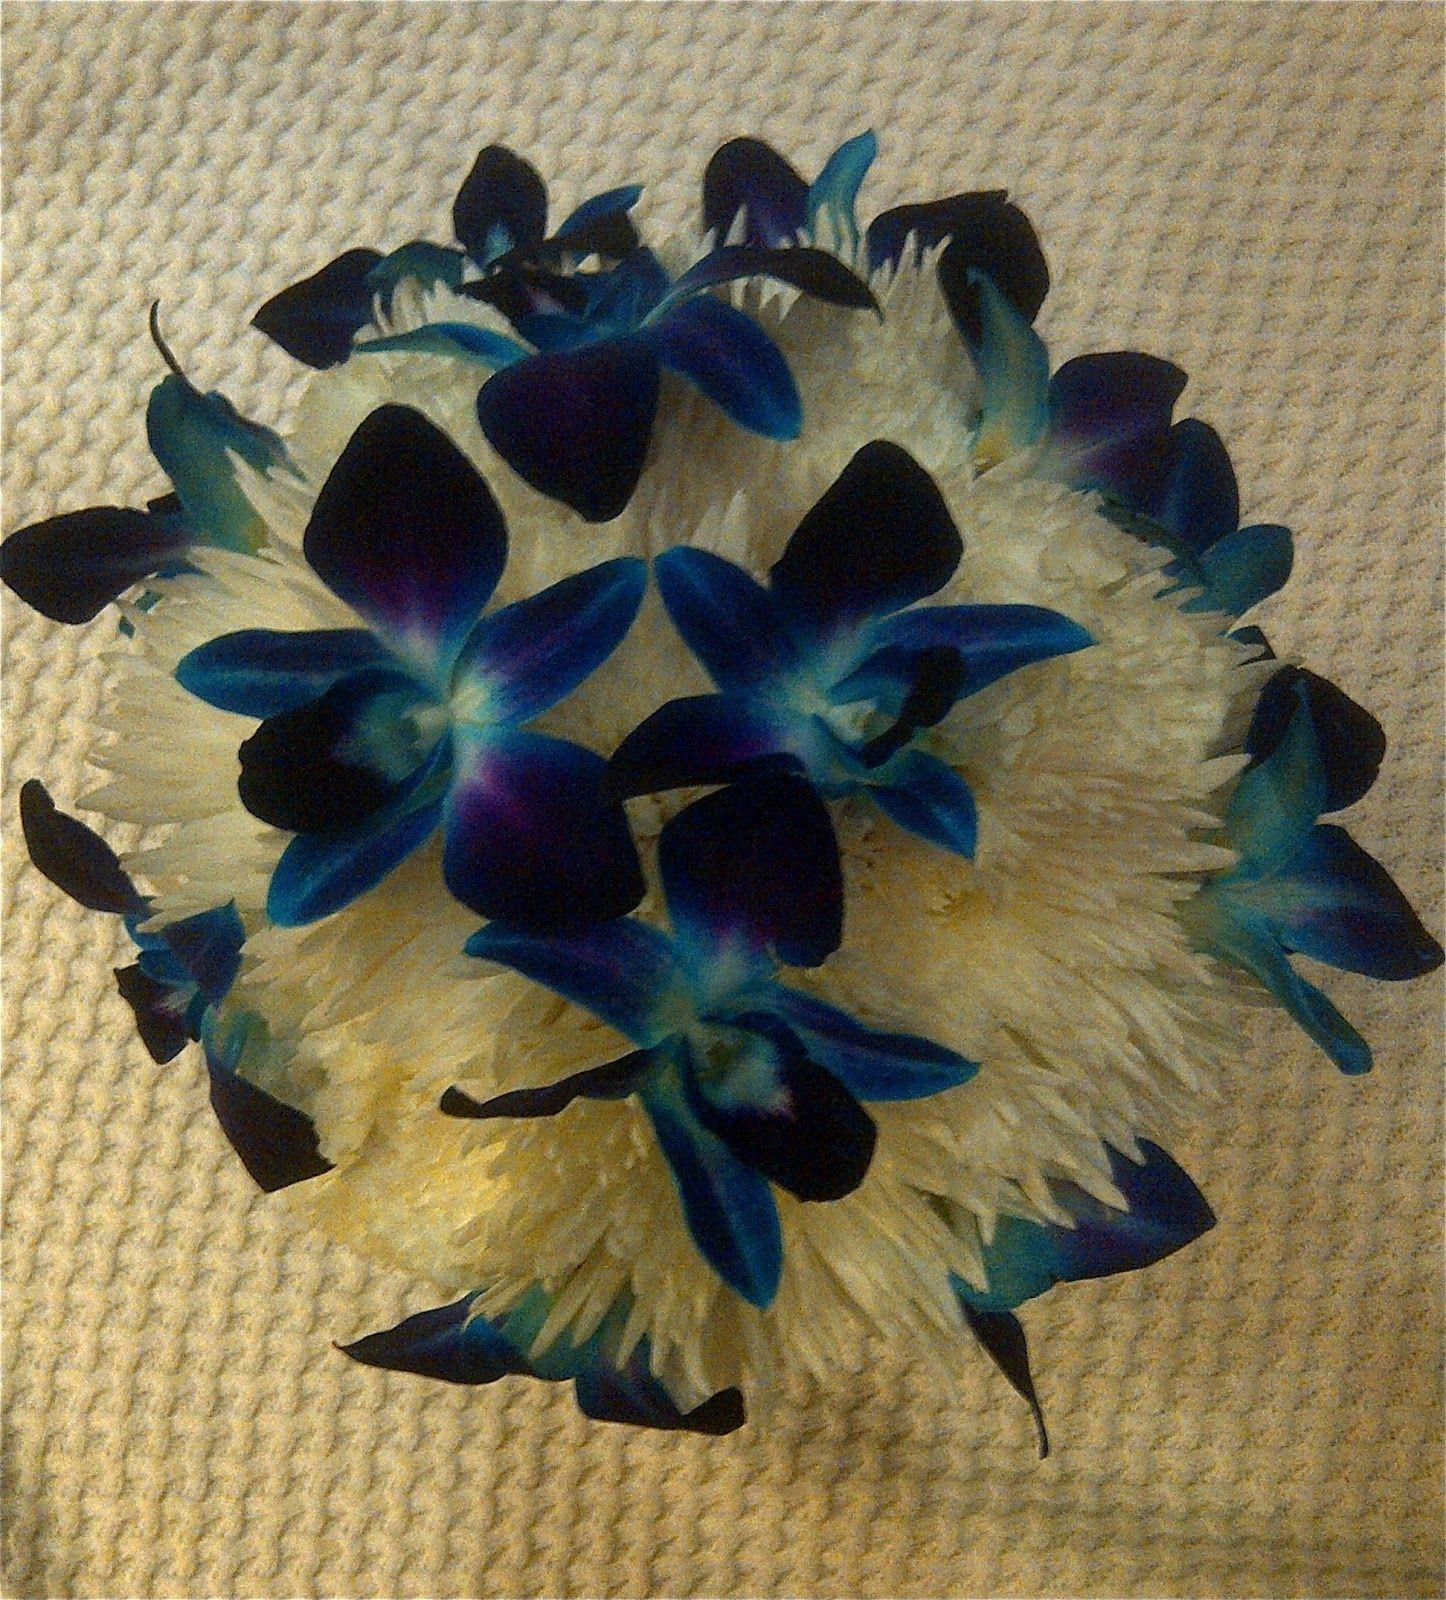 White u blue bridal bouquet white carnations u spider mums with